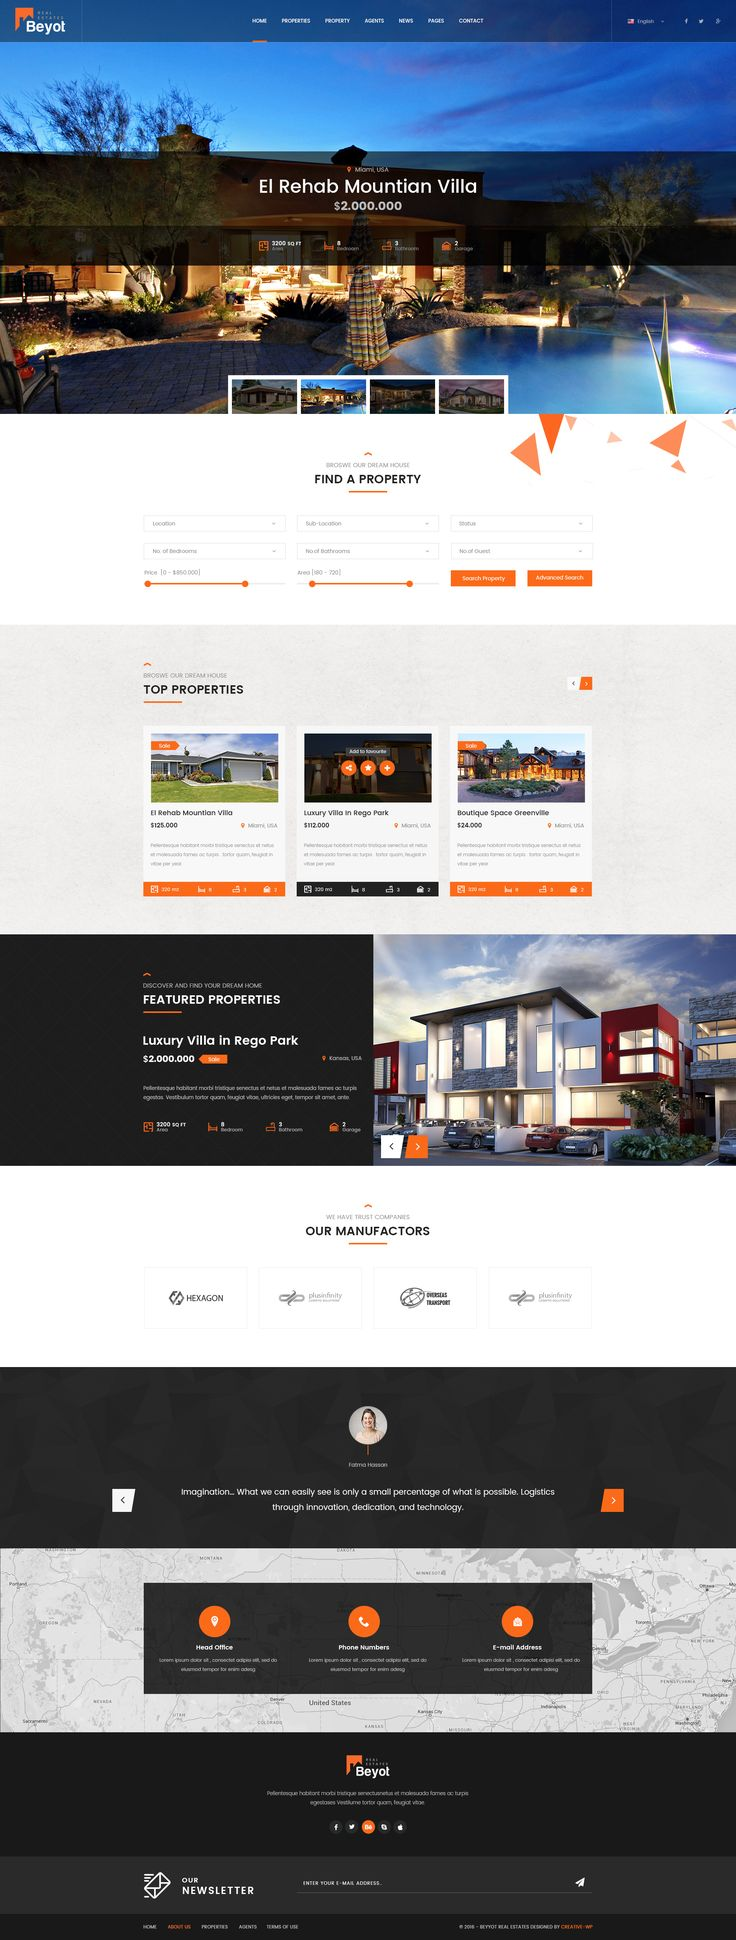 Beyot – Real Estate PSD Template #Real, #Beyot, #Estate, #Template